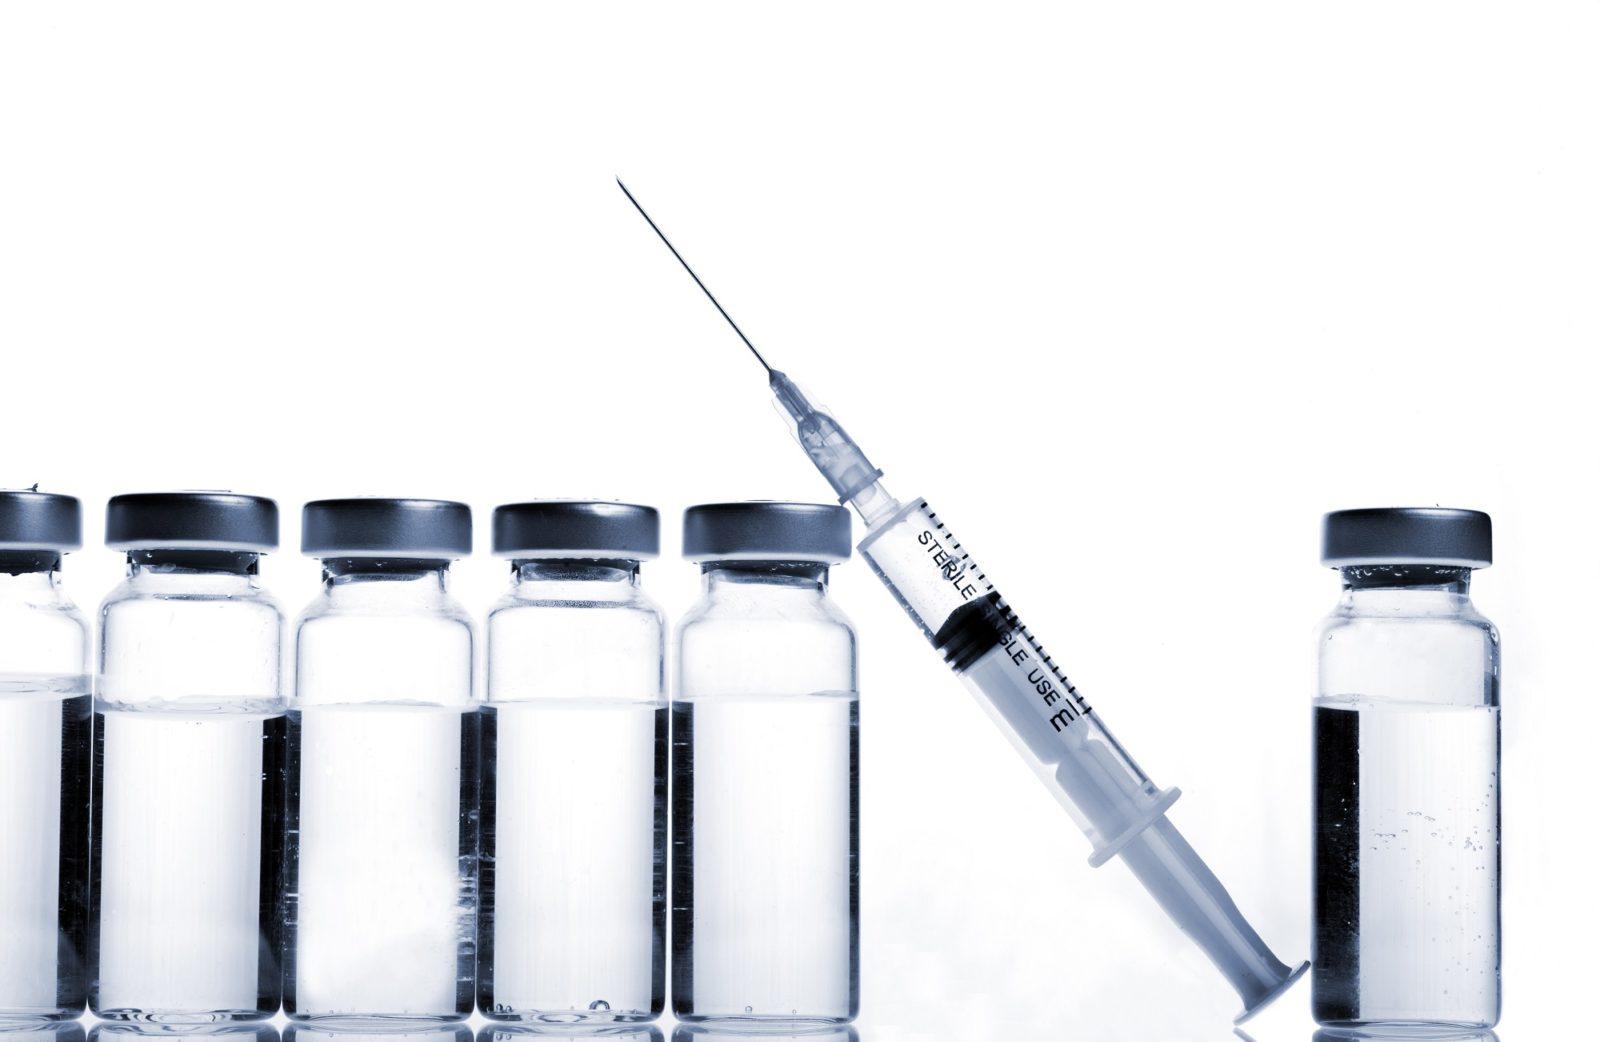 препараты на основе ботулотоксина